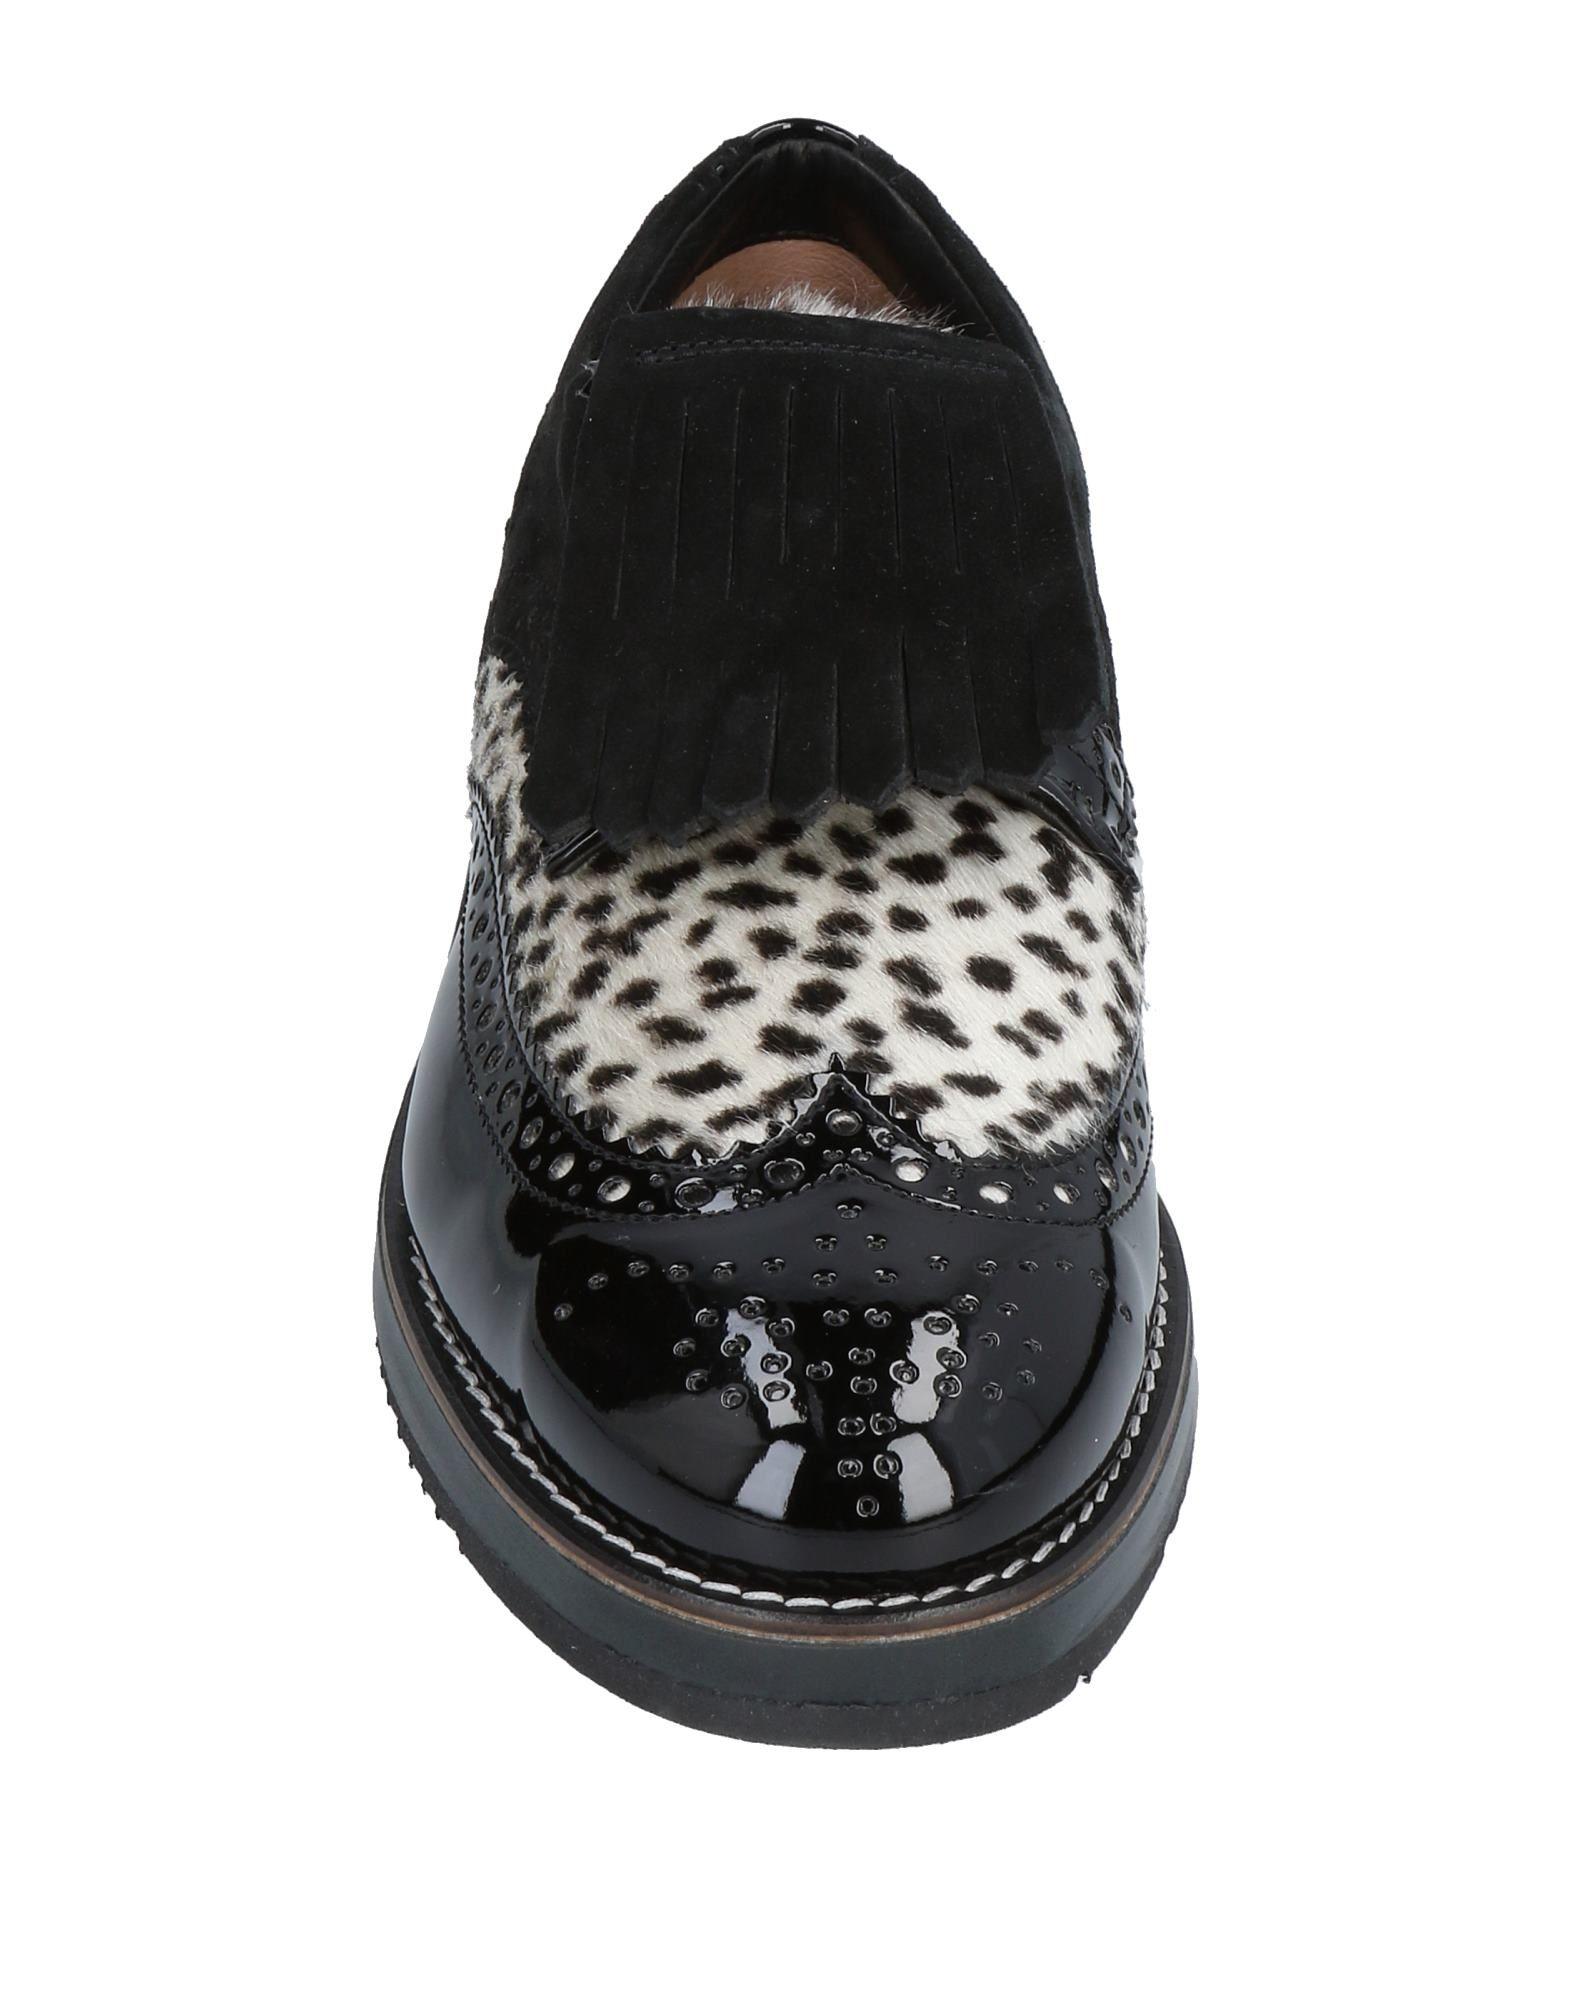 Rabatt Barleycorn echte Schuhe Barleycorn Rabatt Mokassins Herren  11481226WH 0a2f7a